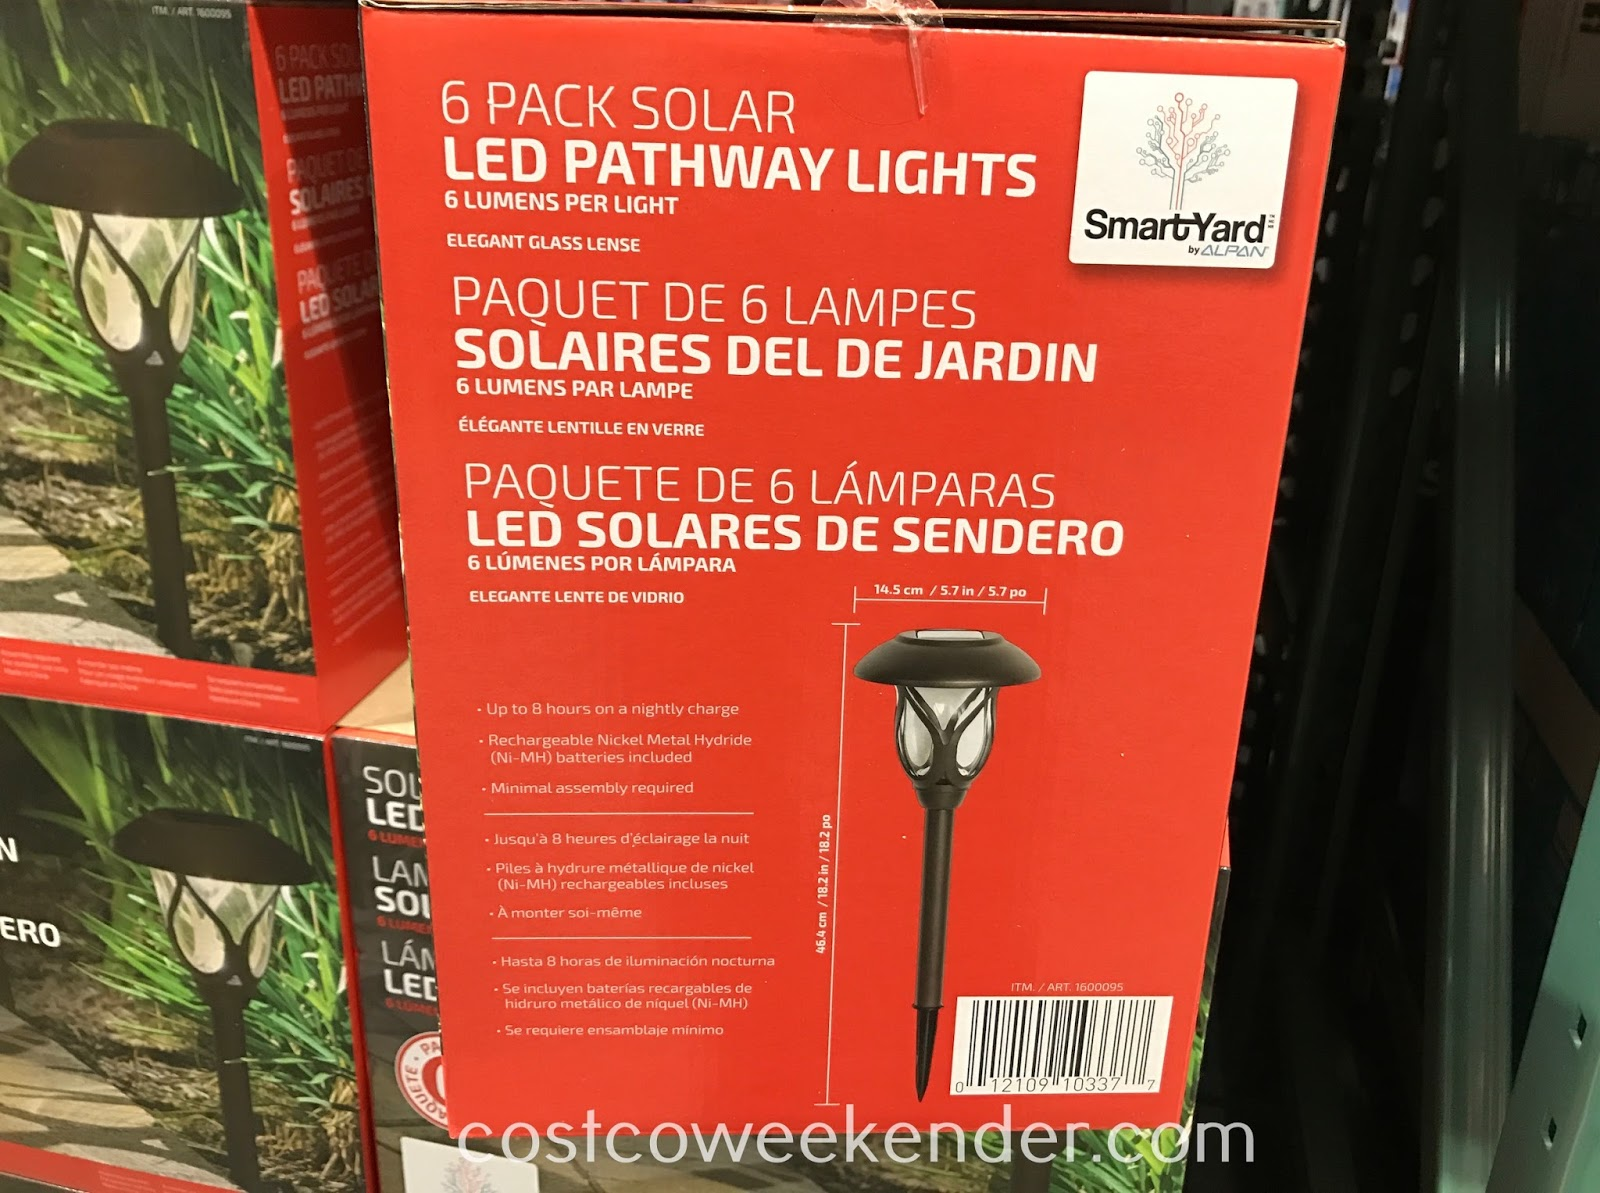 alpan smartyard solar led pathway